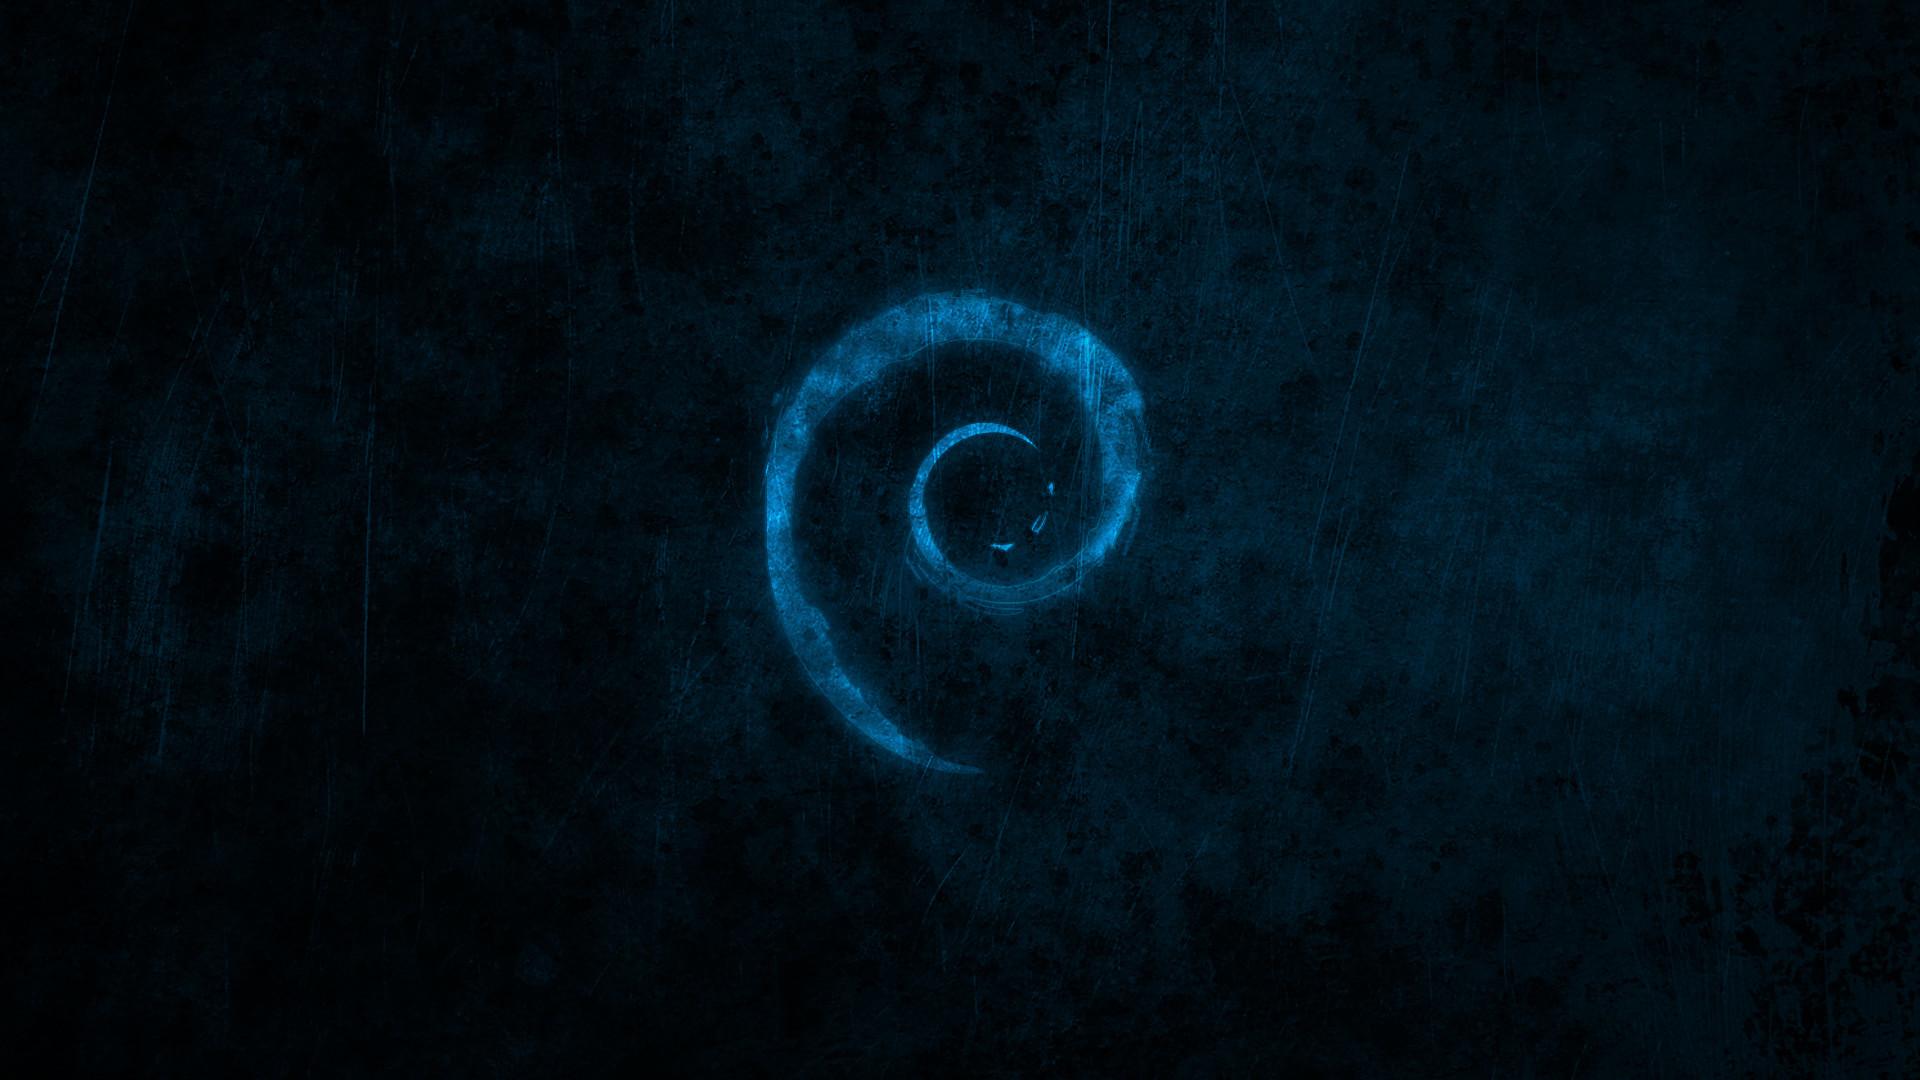 … Debian Dark Wallpapers HD 1080 by malkowitch